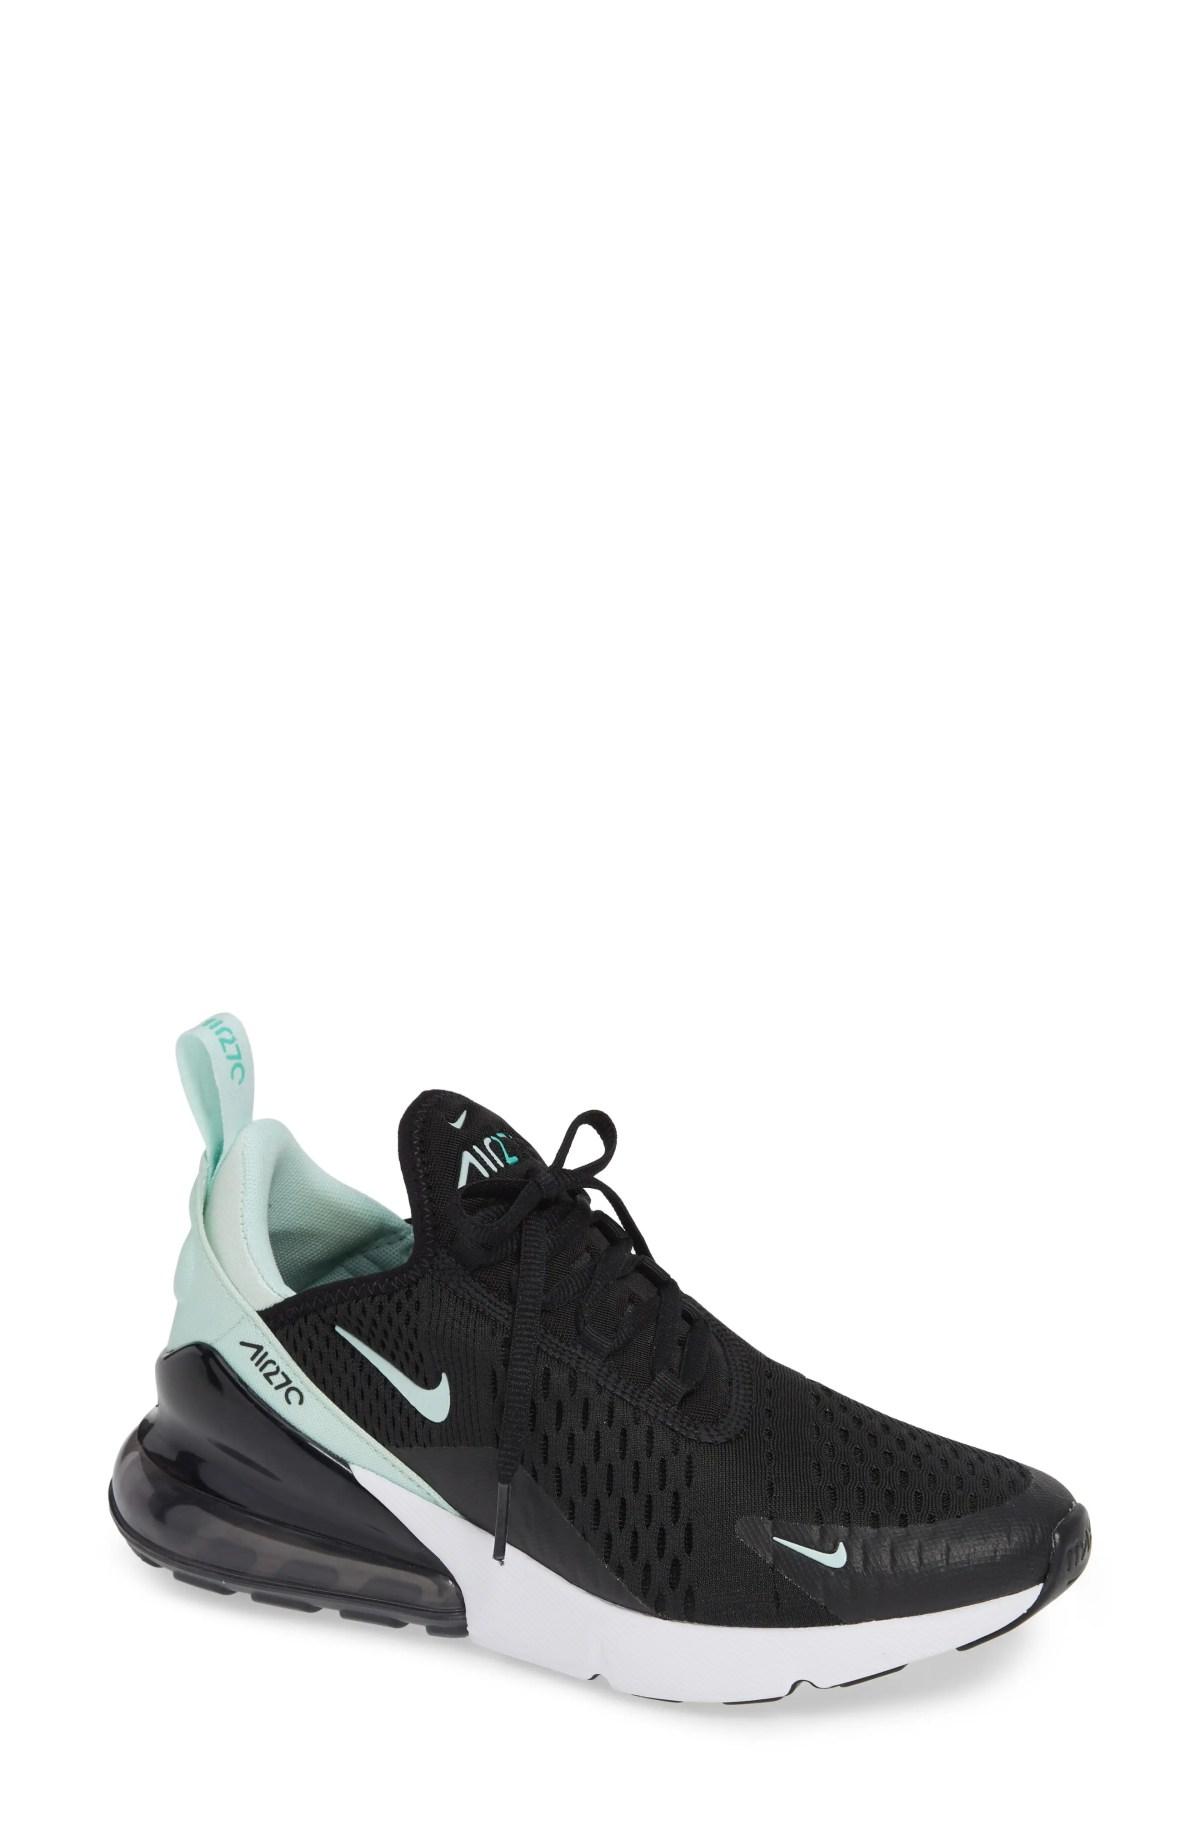 NIKE Air Max 270 Premium Sneaker, Main, color, BLACK/ IGLOO TURQUOISE WHITE